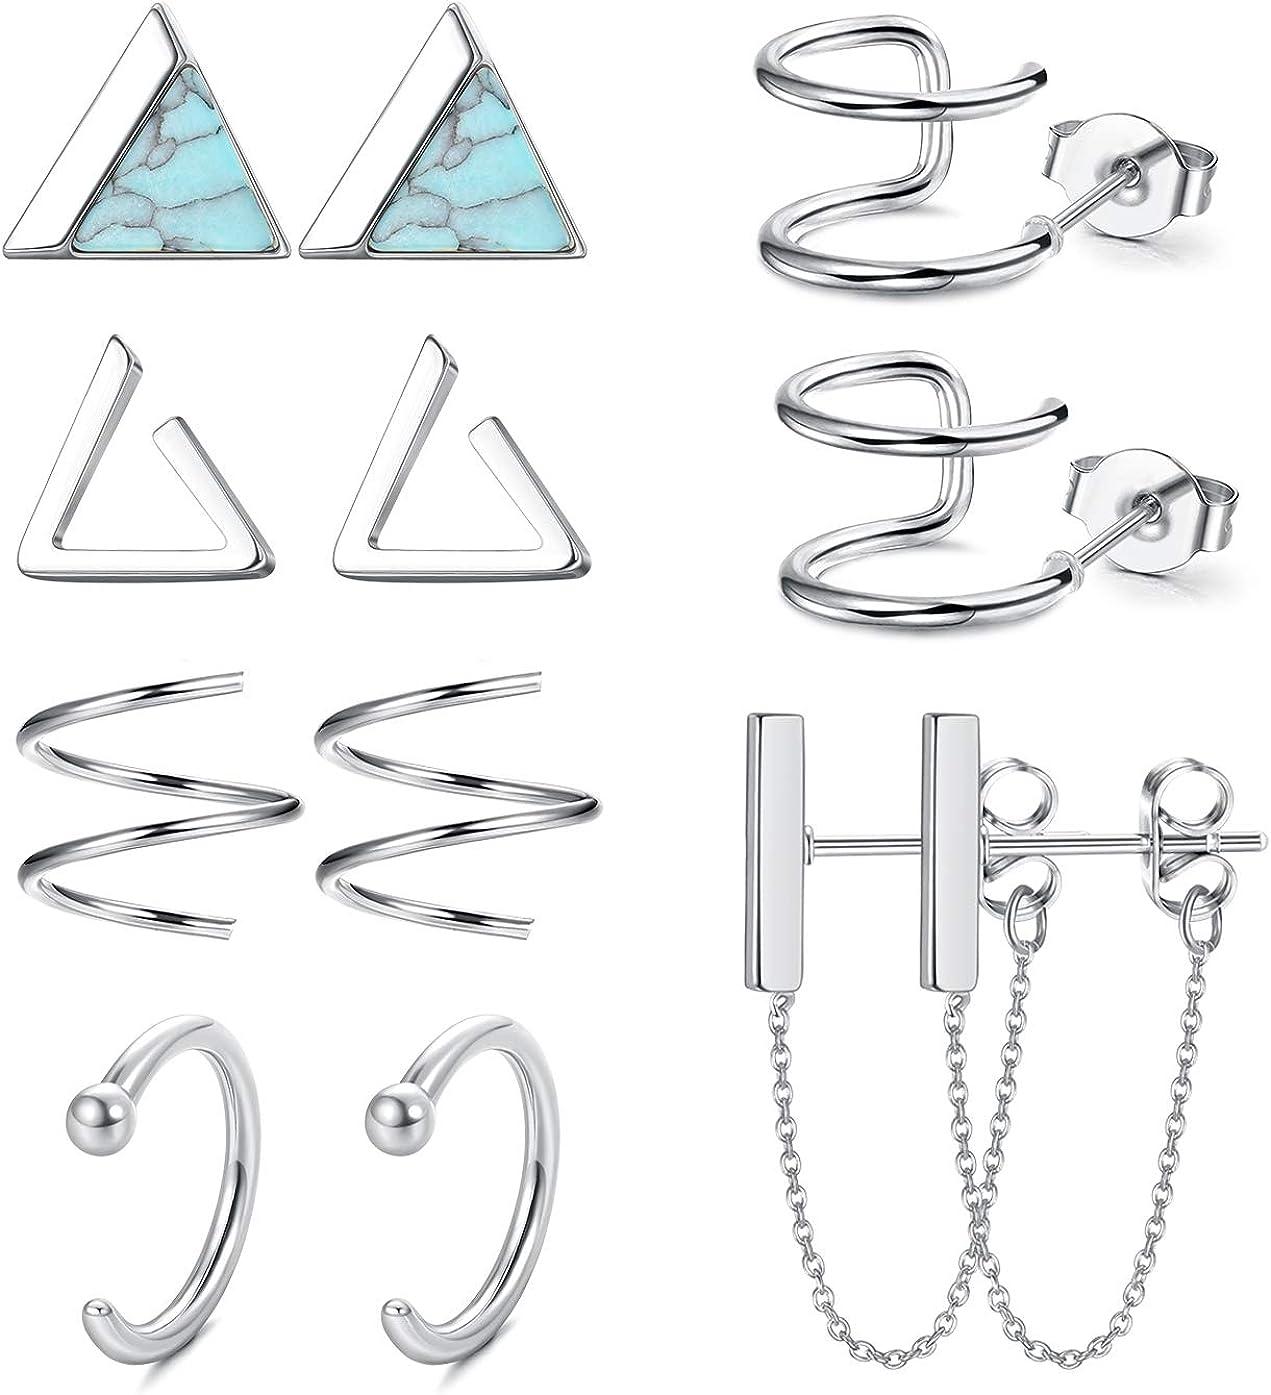 ORAZIO 6 Pairs Minimalist Hoop Stud Earrings Set for Men Women Small Triangle Cuff Huggie Chain Dangle Earrings Stainless Steel Cartilage Helix Piercing Set